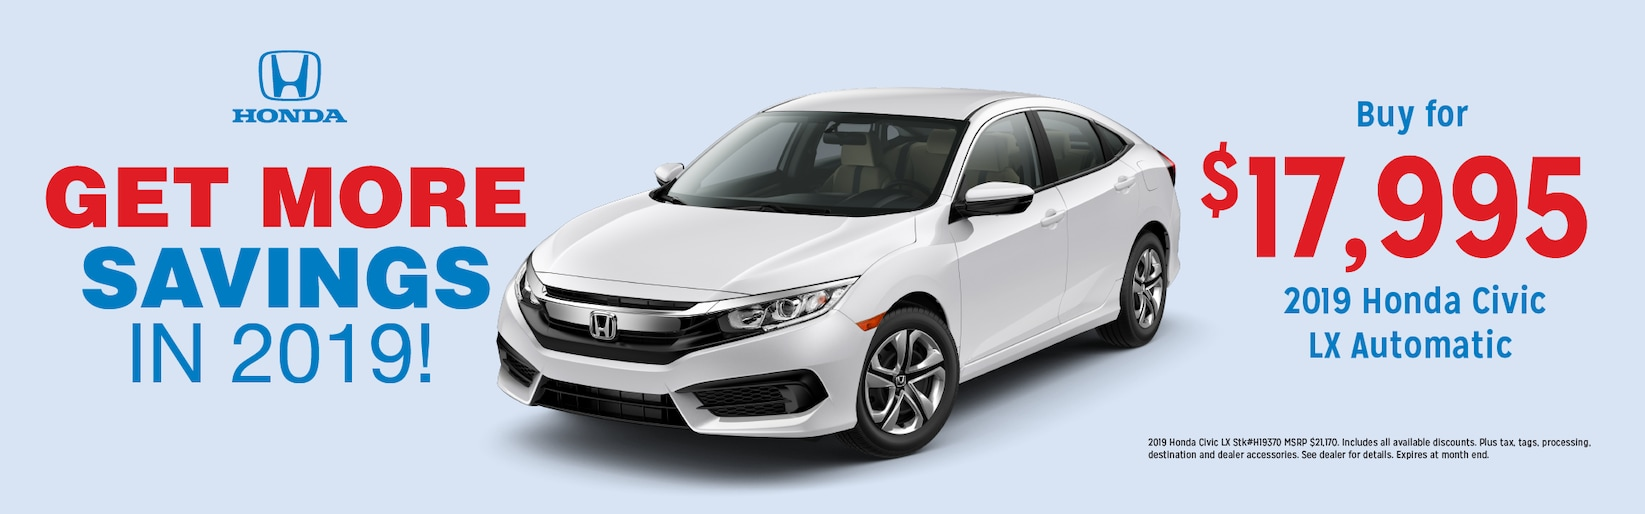 Honda Dealers In Delaware >> Hertrich Honda Of Easton New Honda Dealership In Easton Md 21601